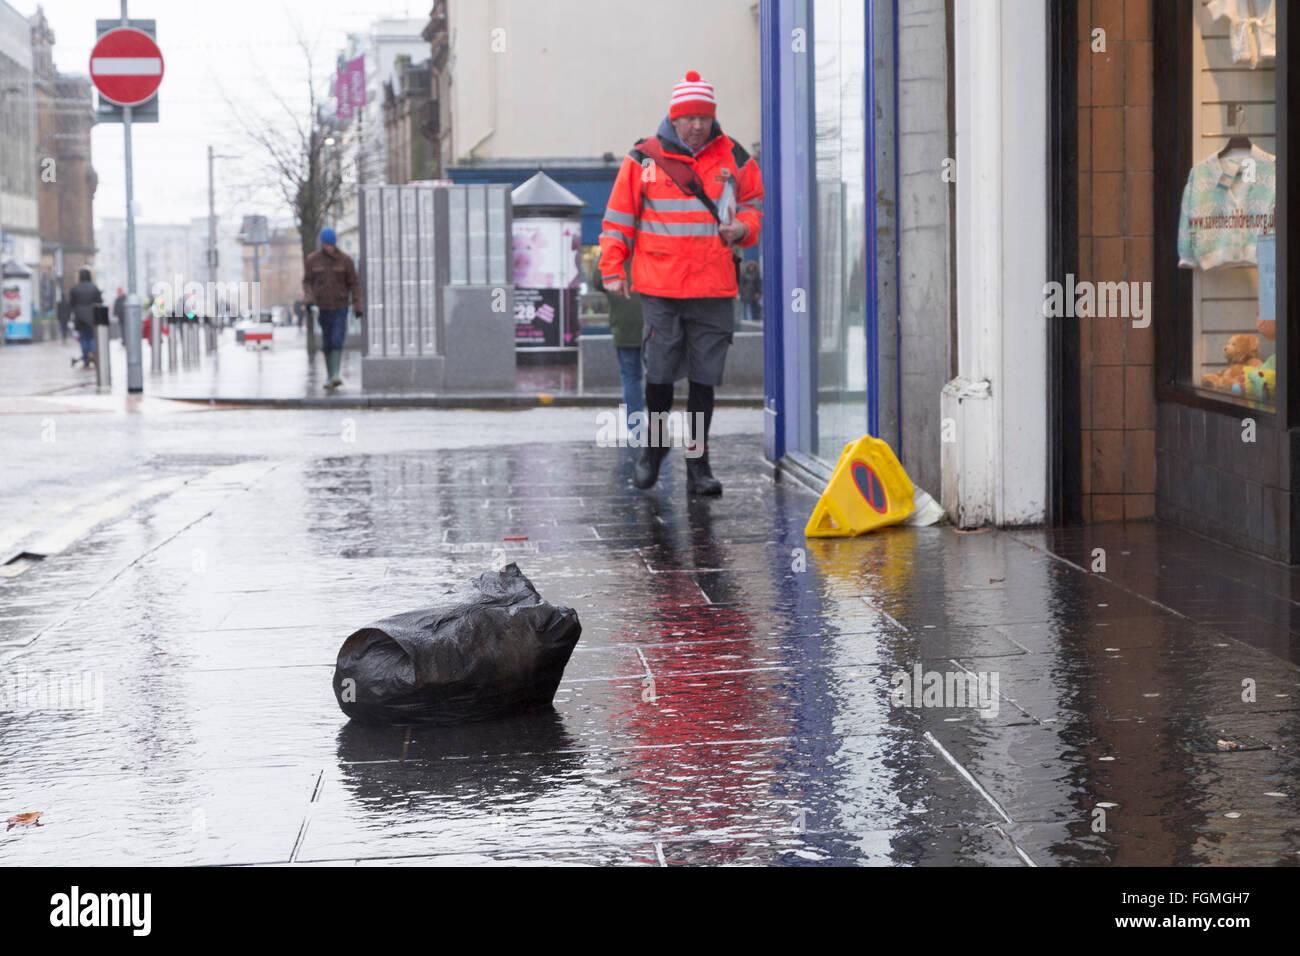 La basura de la calle High Street en Paisley, 26/01/2016 Foto de stock